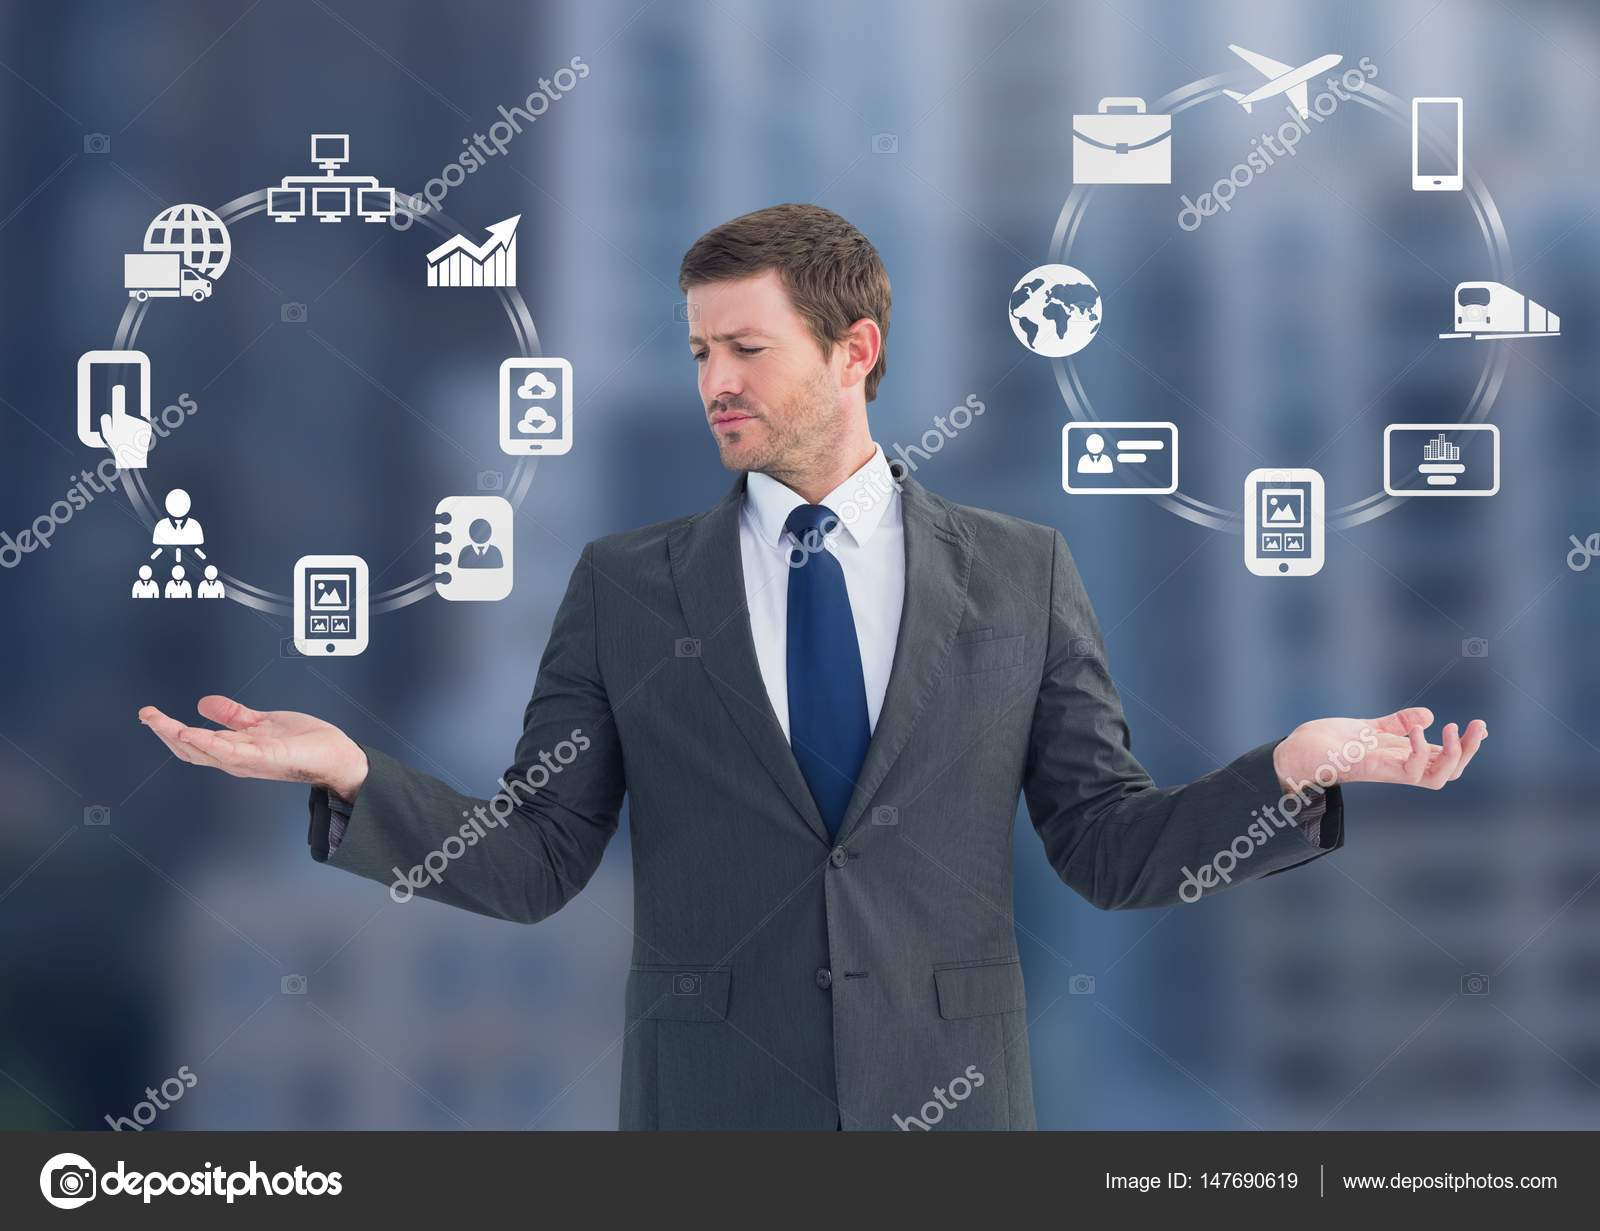 Sole proprietorship (Self-employed)